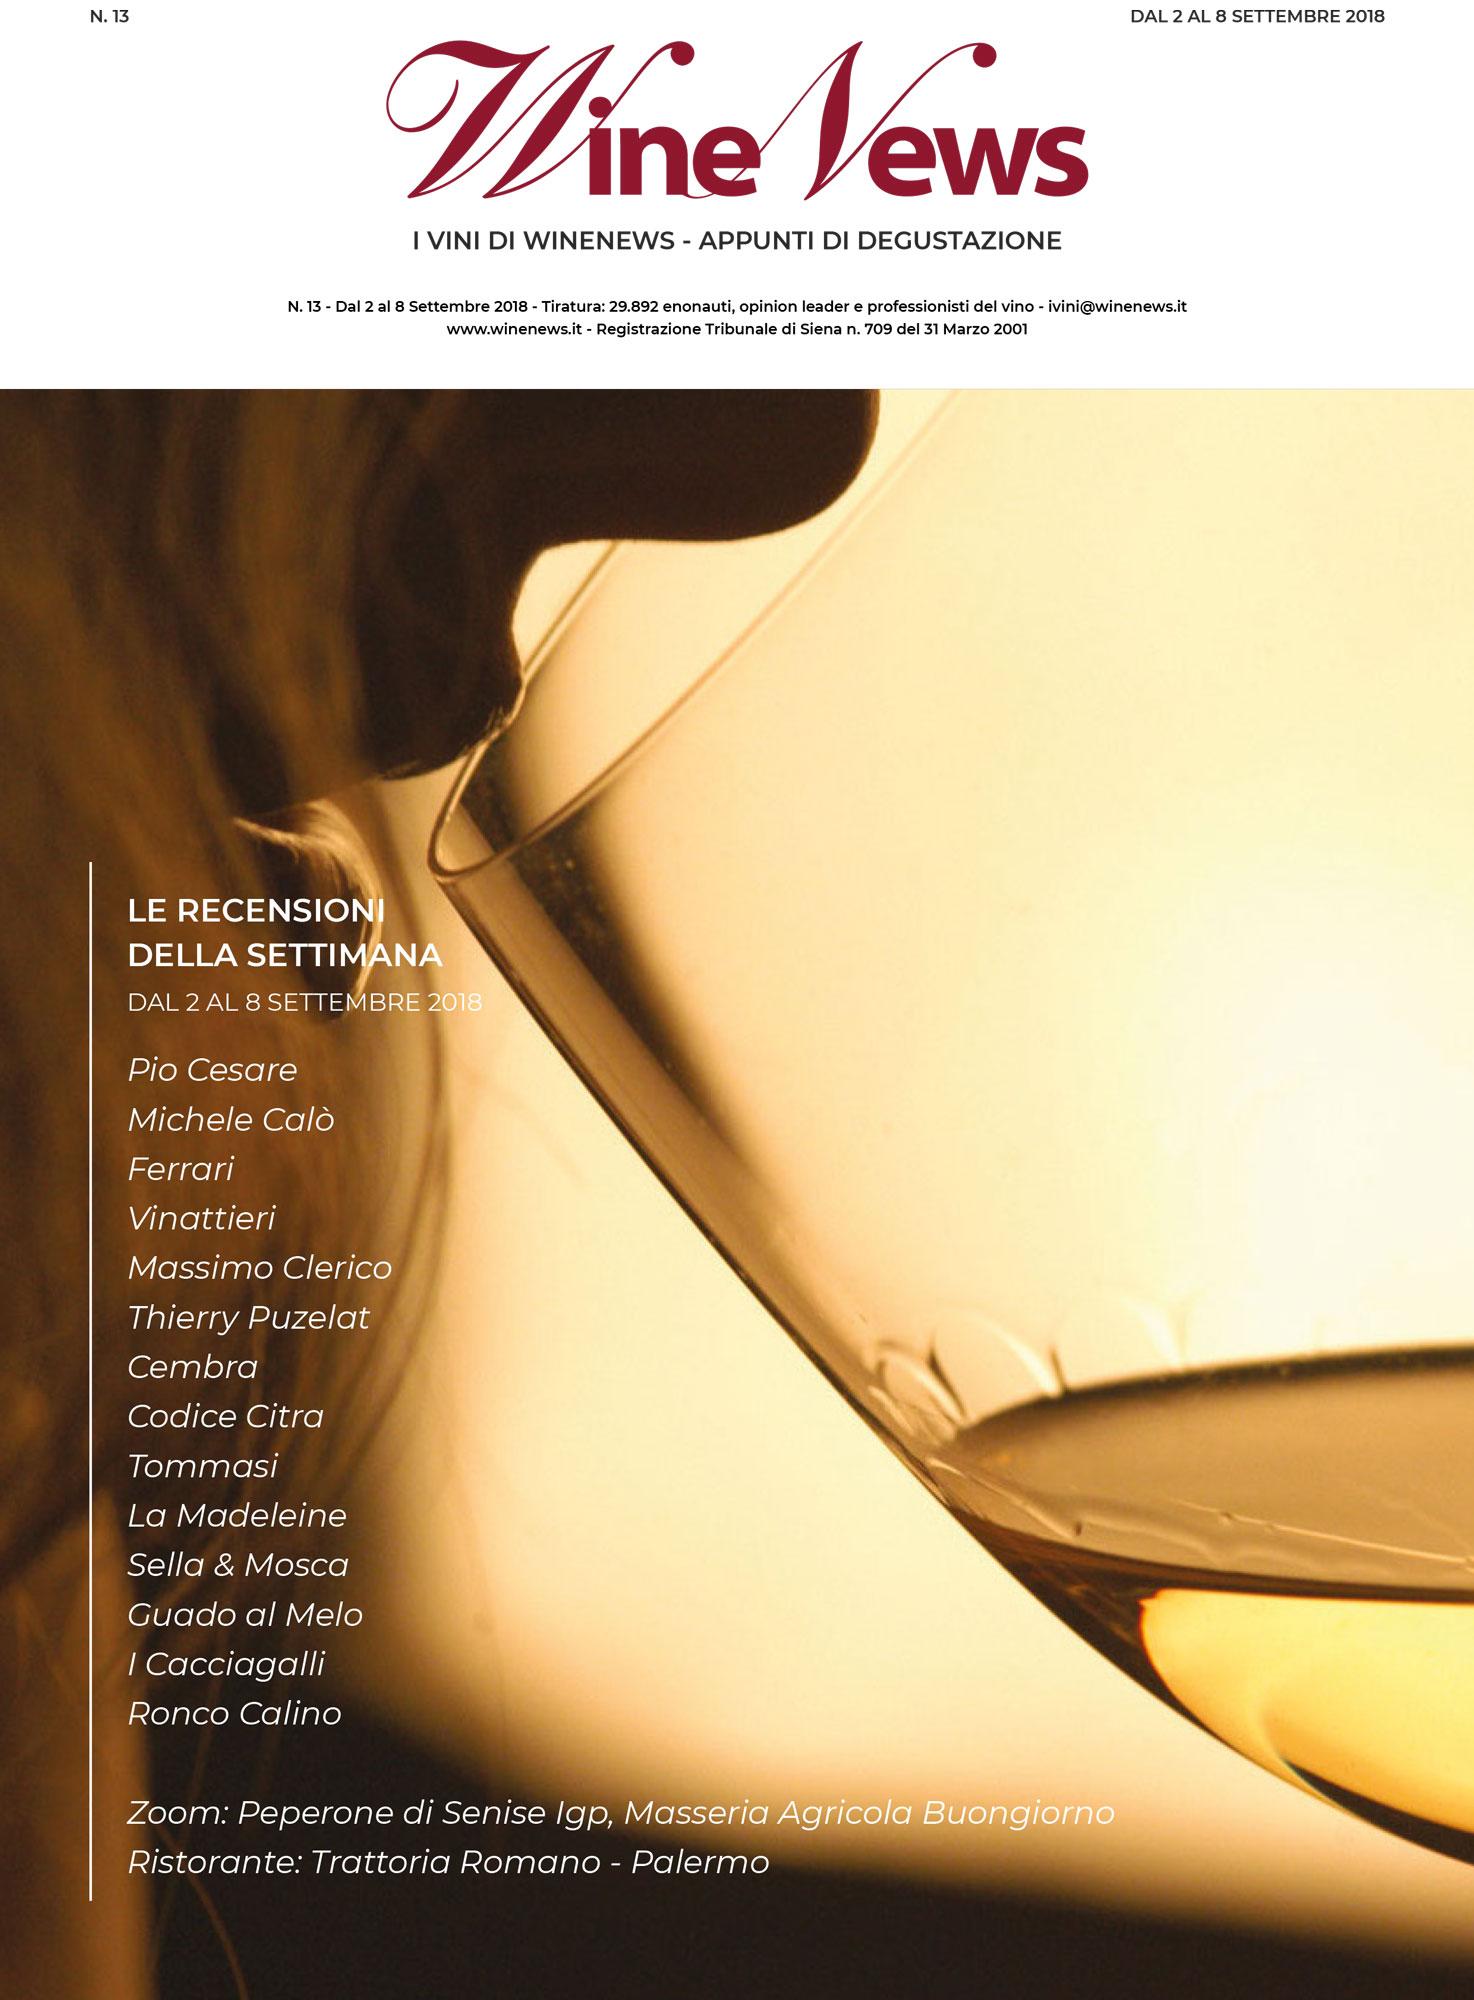 https://winenews.it/php/redirect_pdf.php?id=371939&t=1535721698